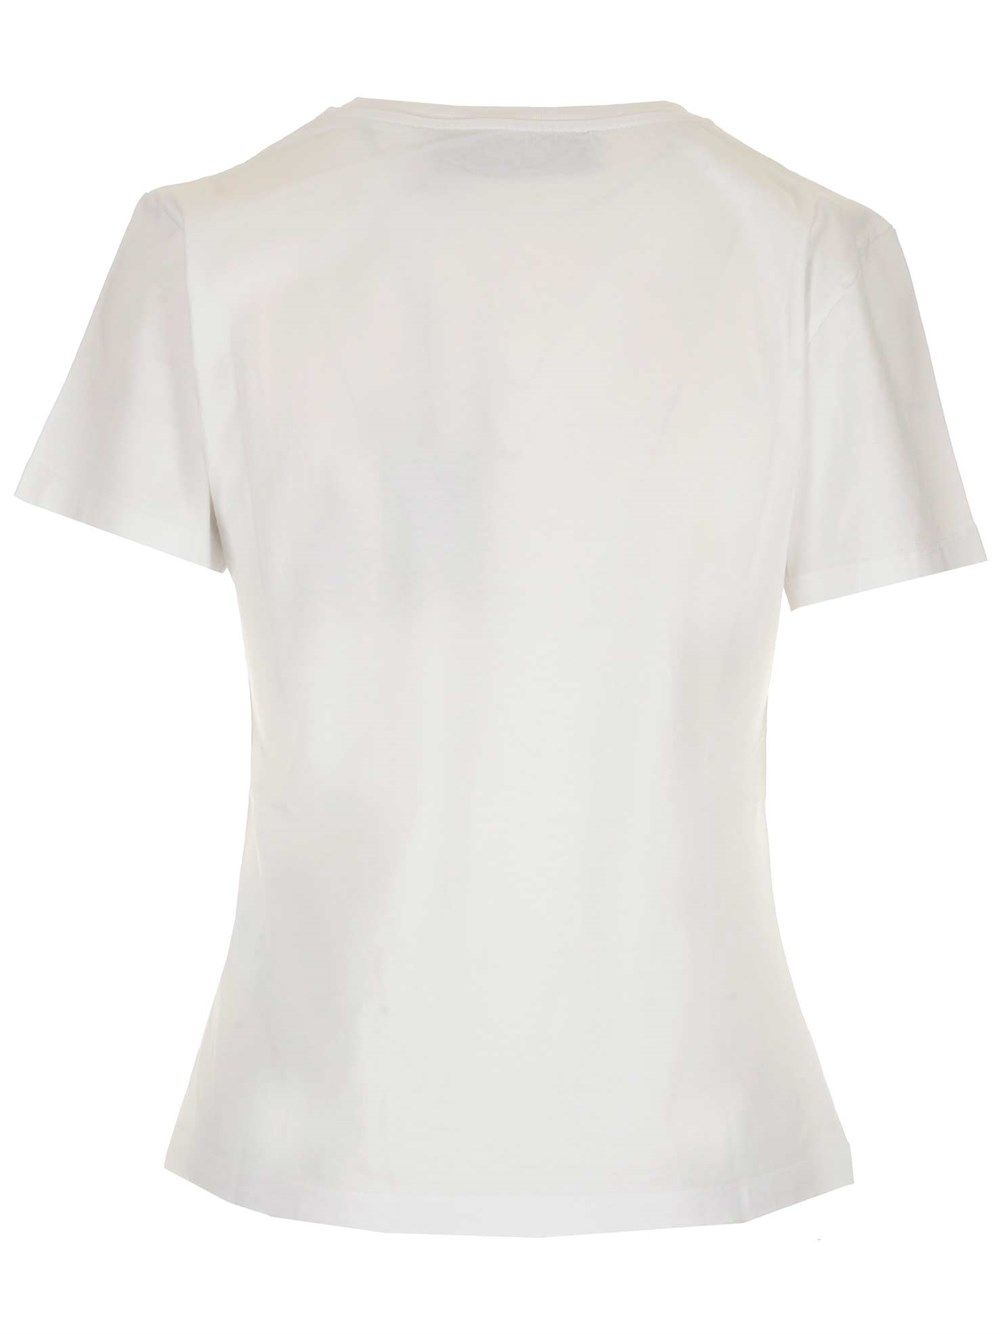 GOLDEN GOOSE Cottons GOLDEN GOOSE WOMEN'S WHITE OTHER MATERIALS T-SHIRT